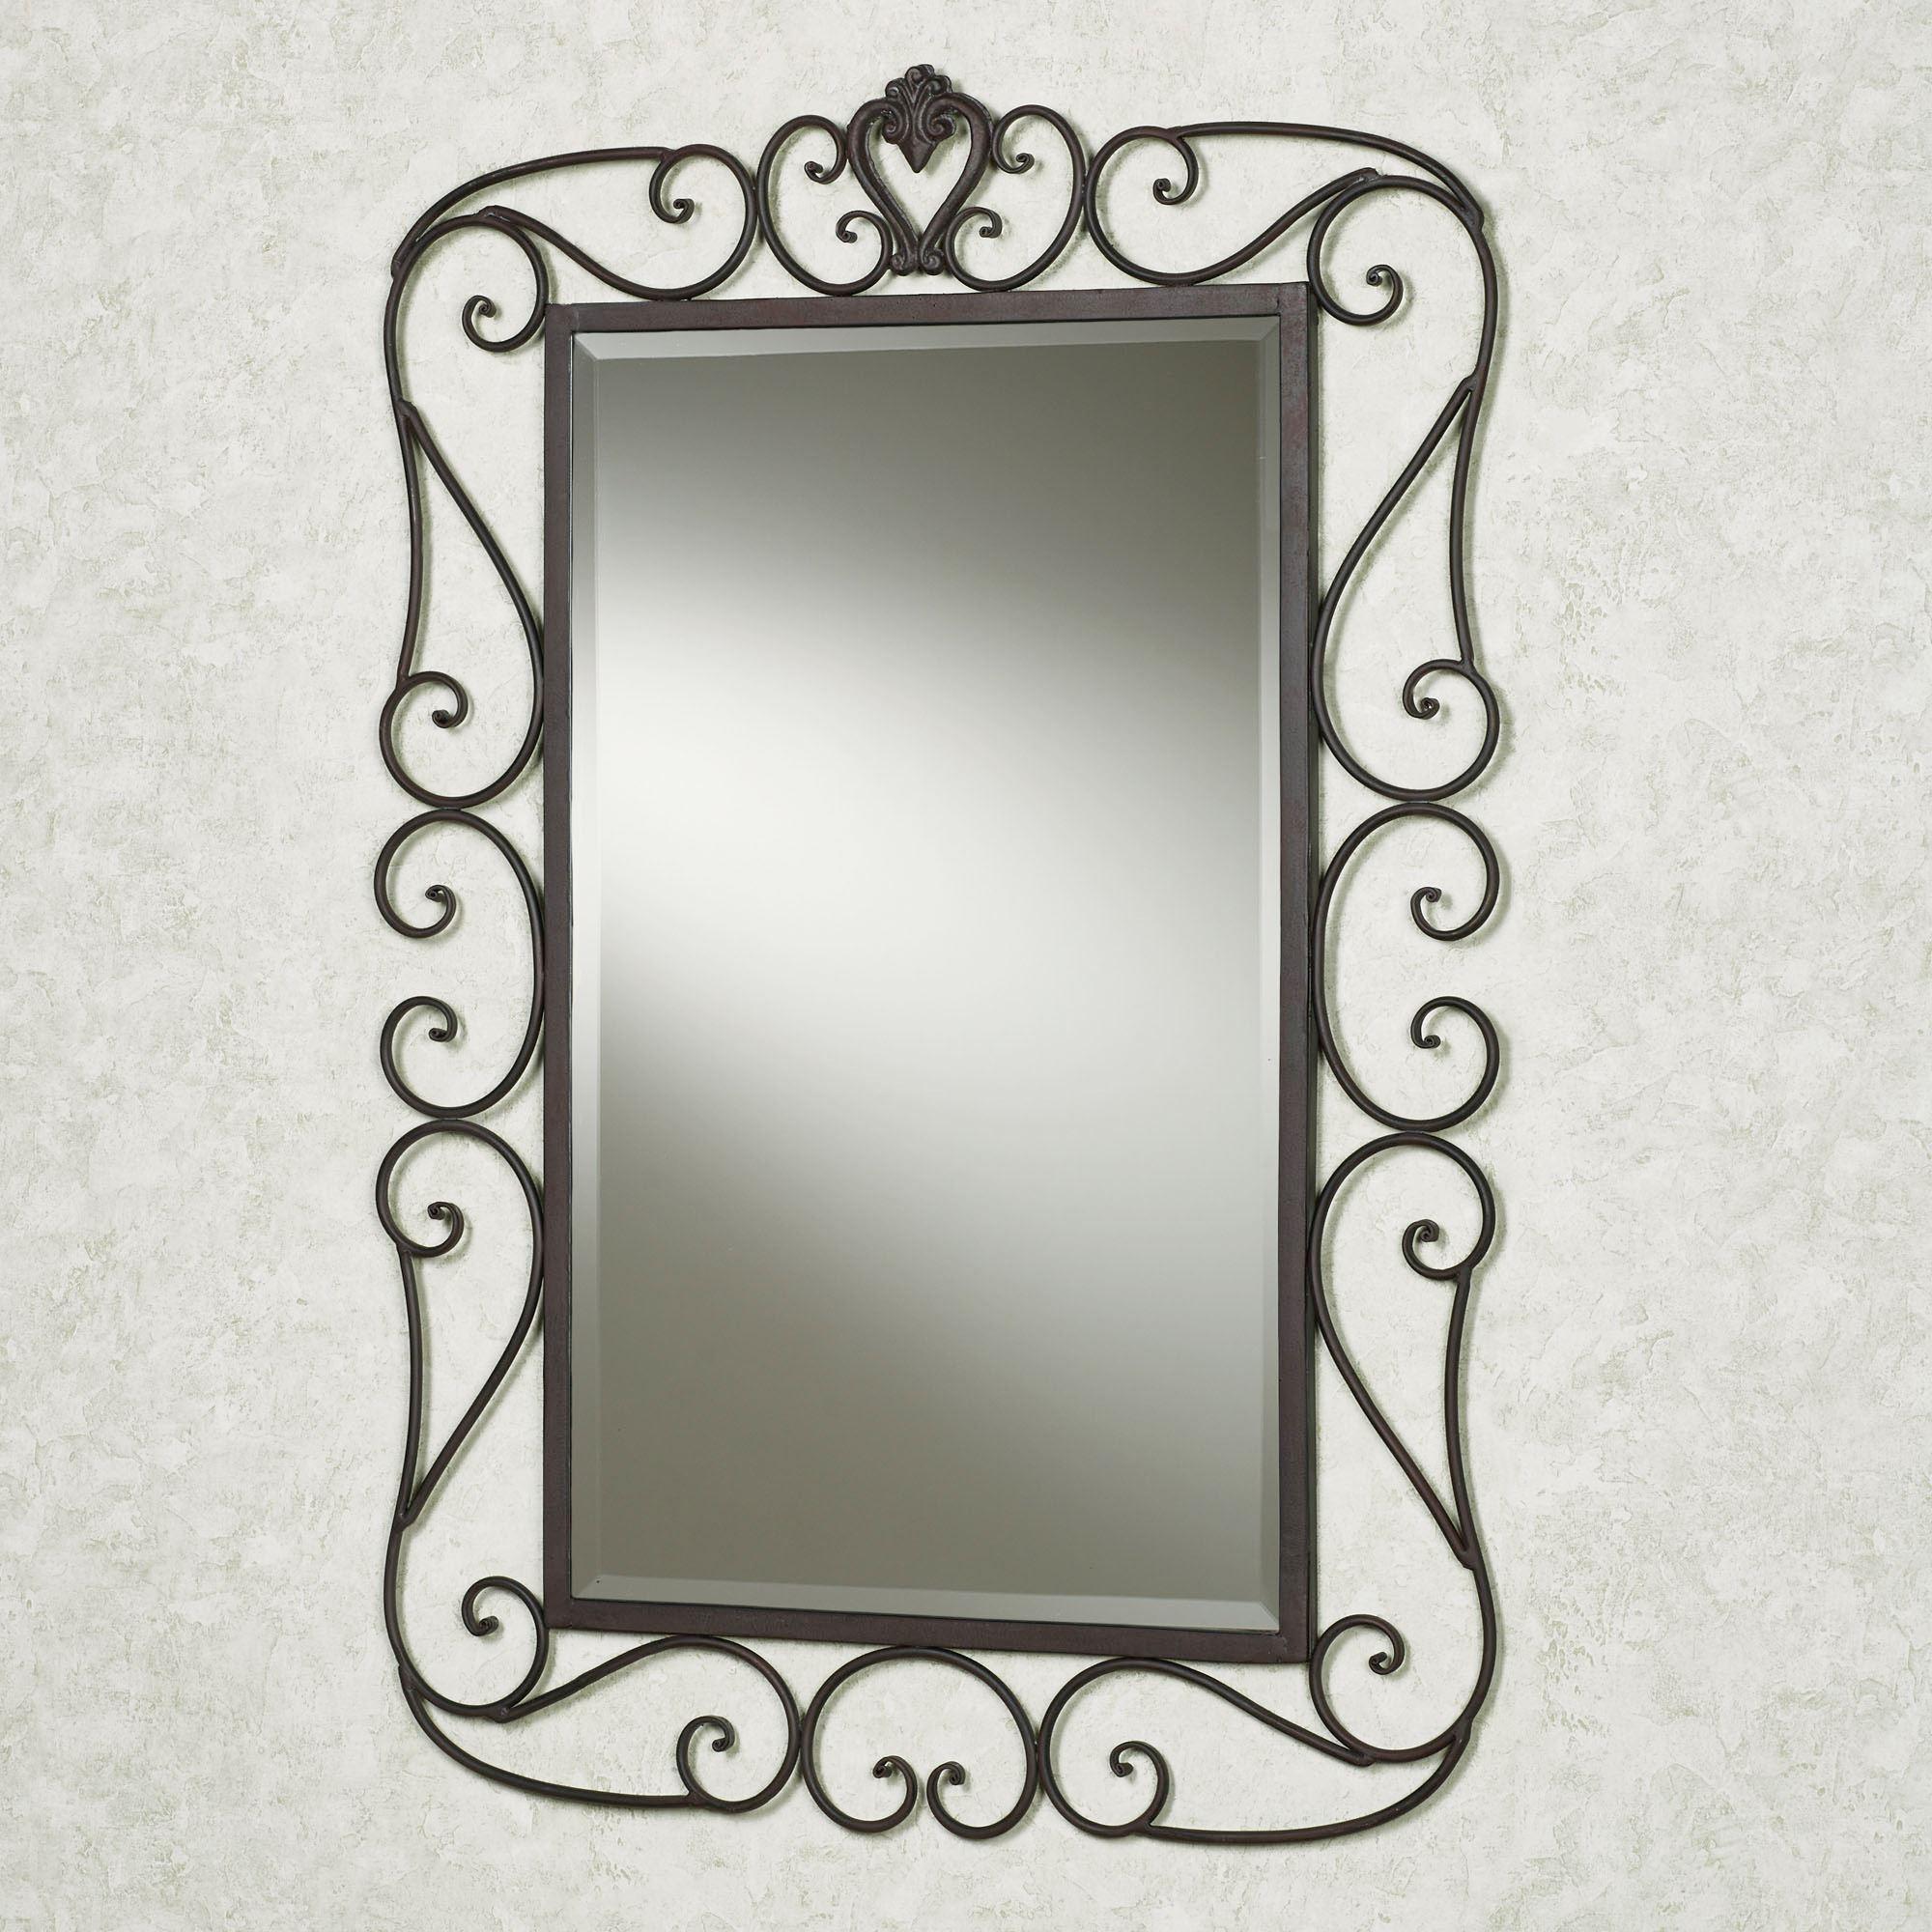 Wrought Iron Wall Mirrors